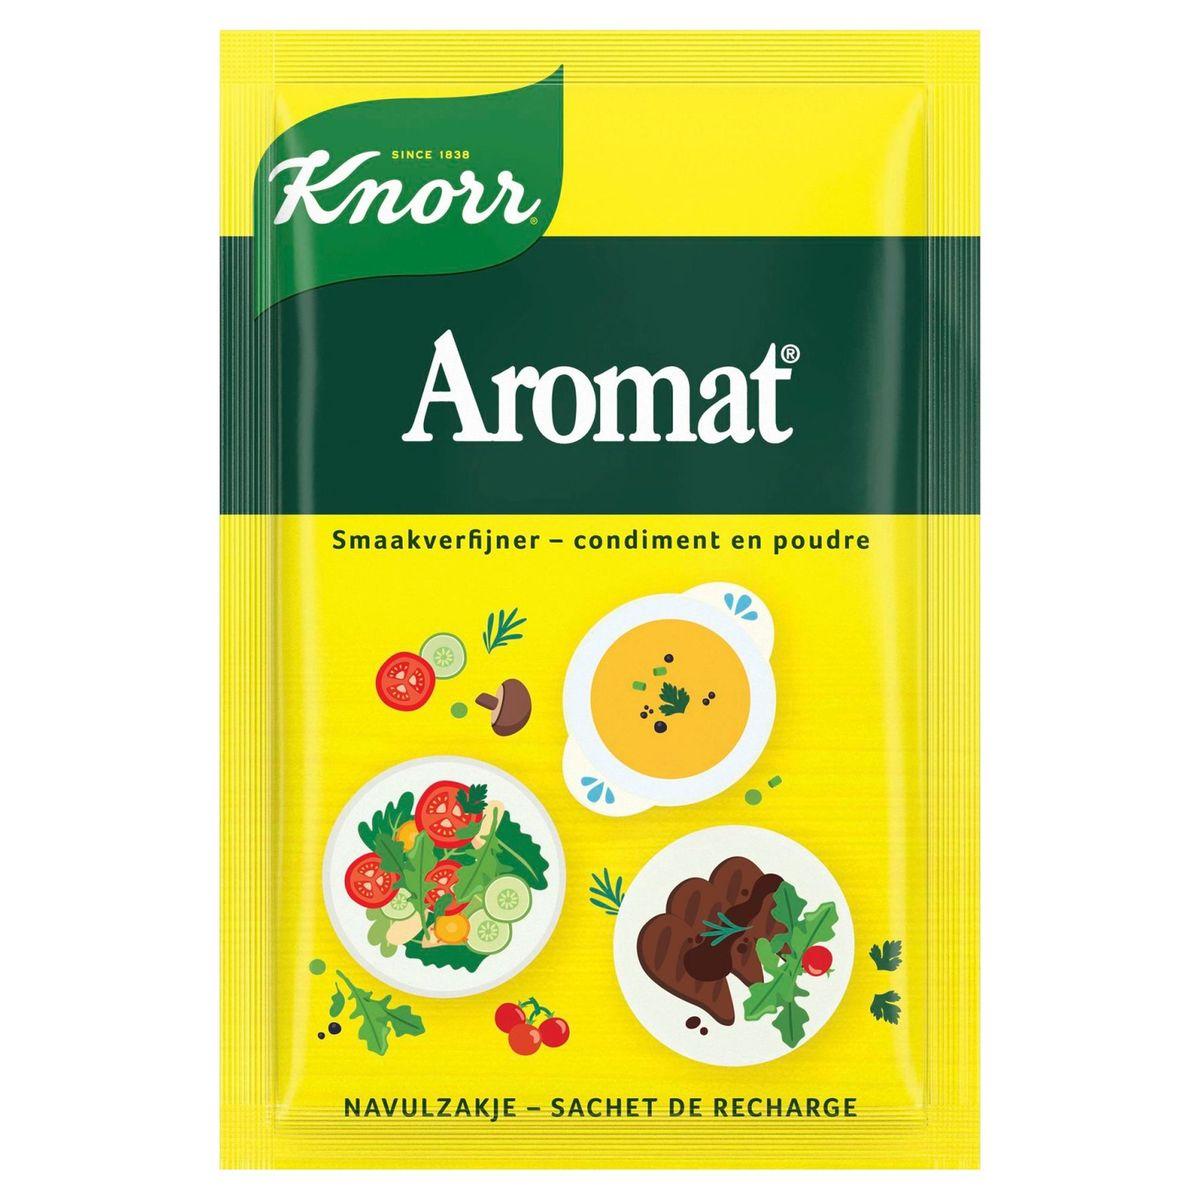 Knorr Aromat Poeder Smaakverfijner Natuur (Navulzakje) 38 g